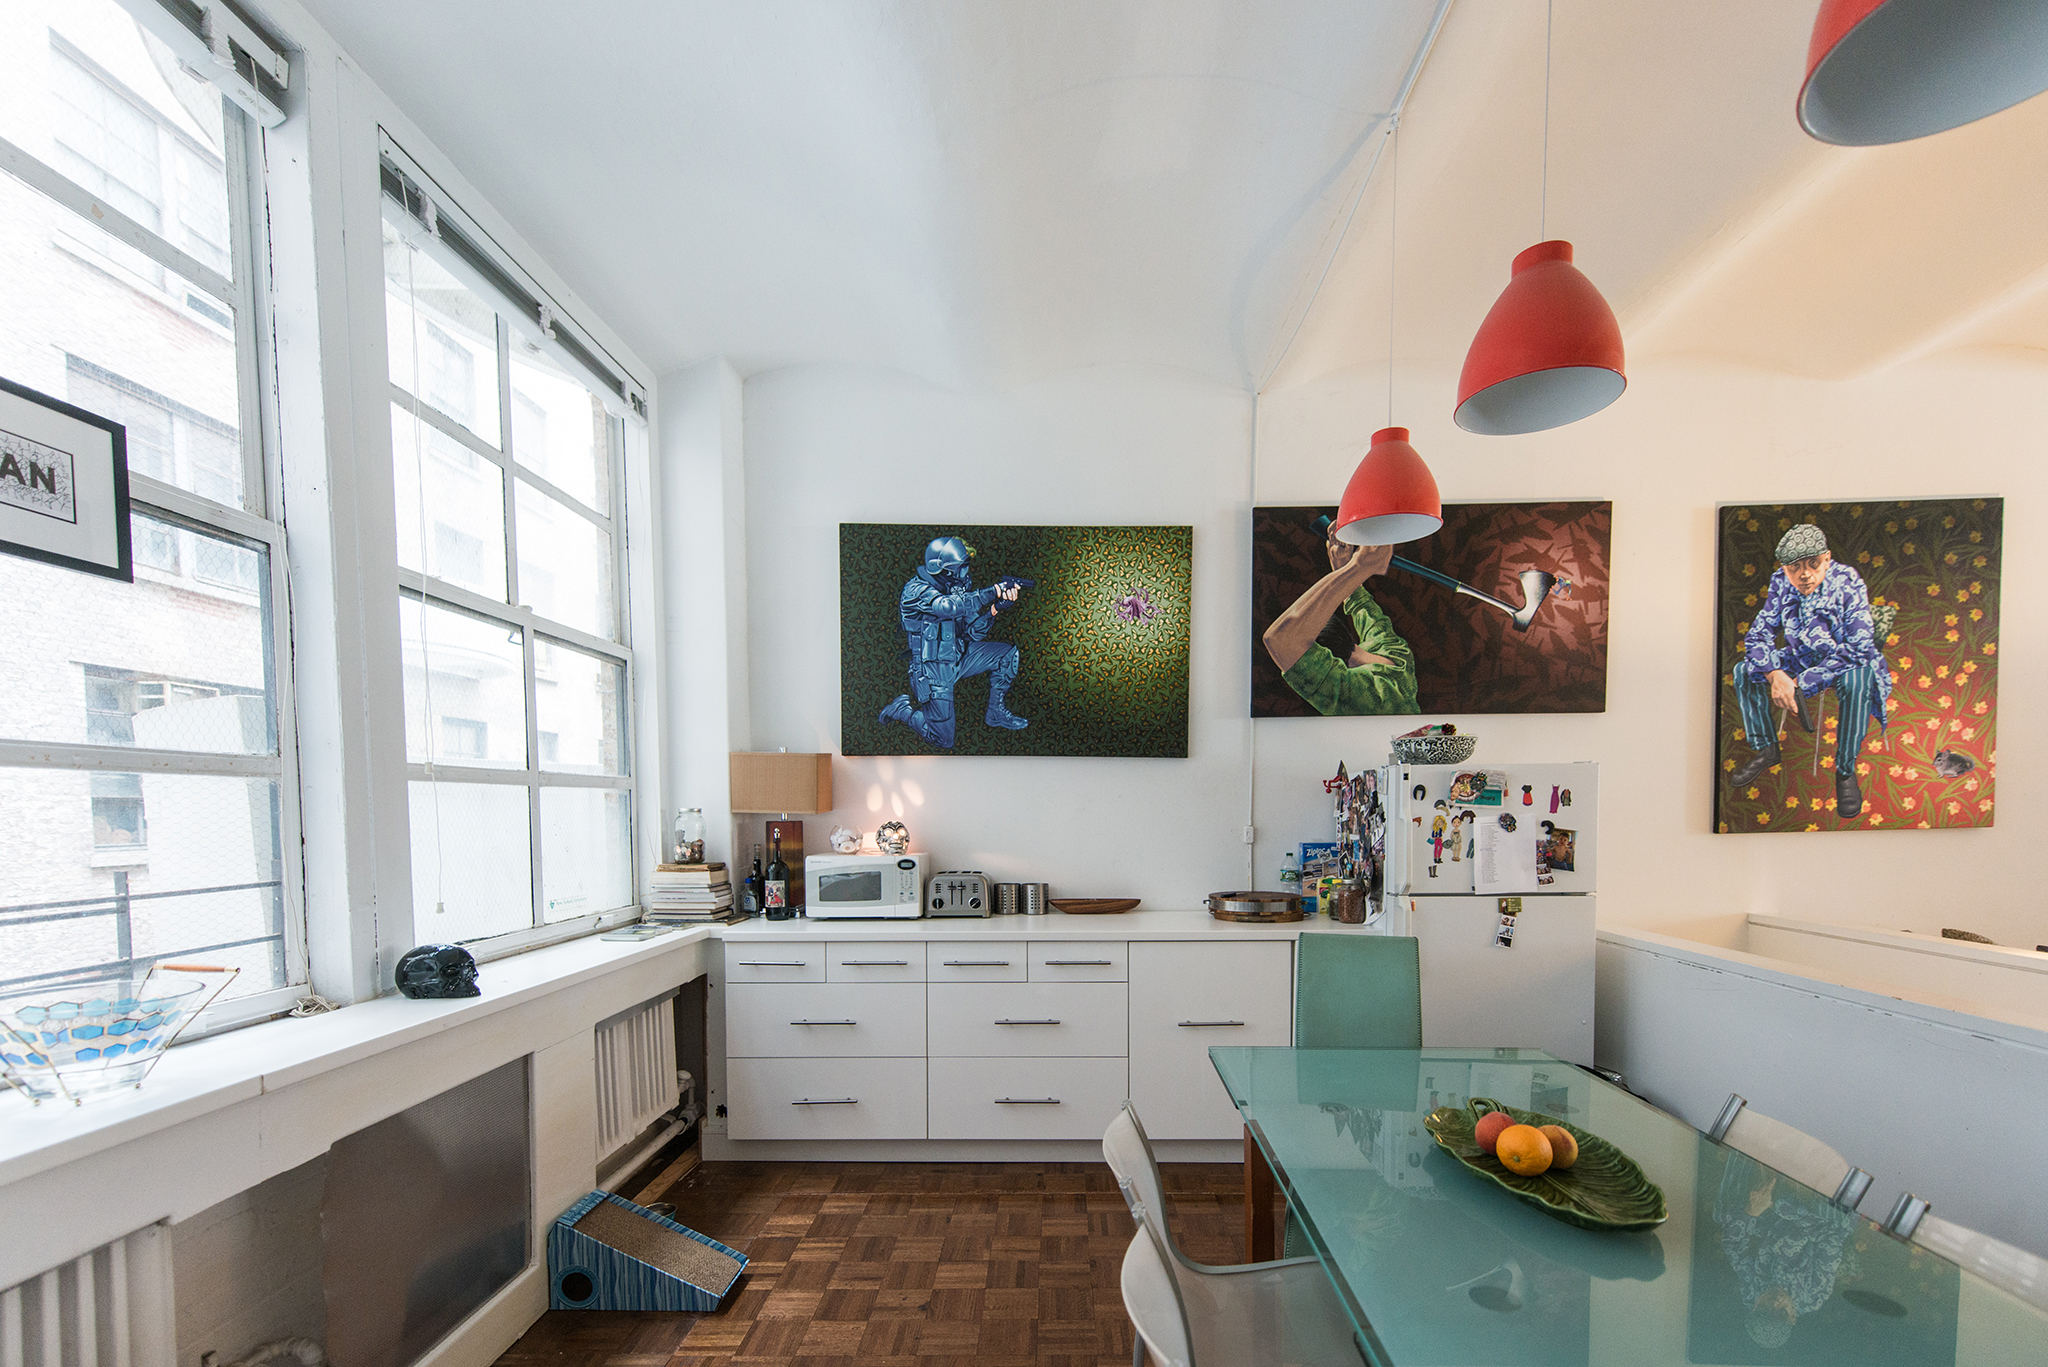 Westbeth Artists' Housing